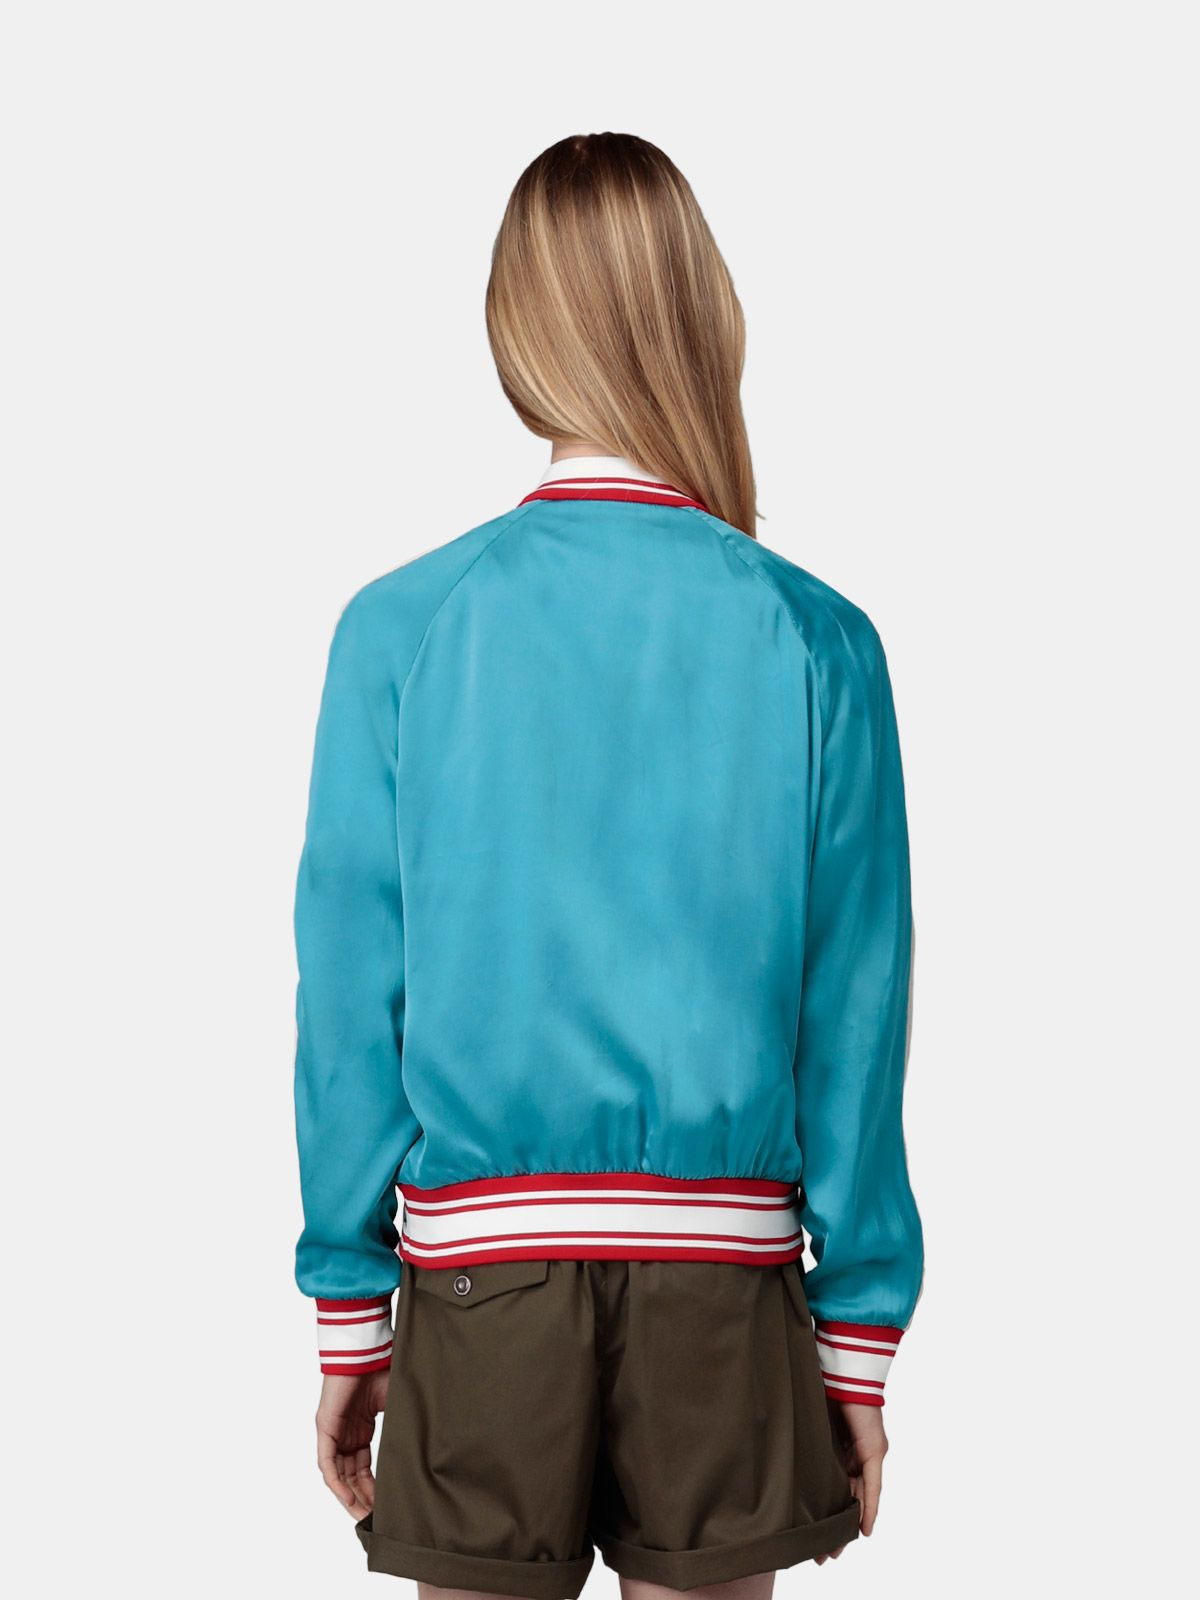 Golden Goose - Sophia bomber jacket in blue satin with contrasting side bands in